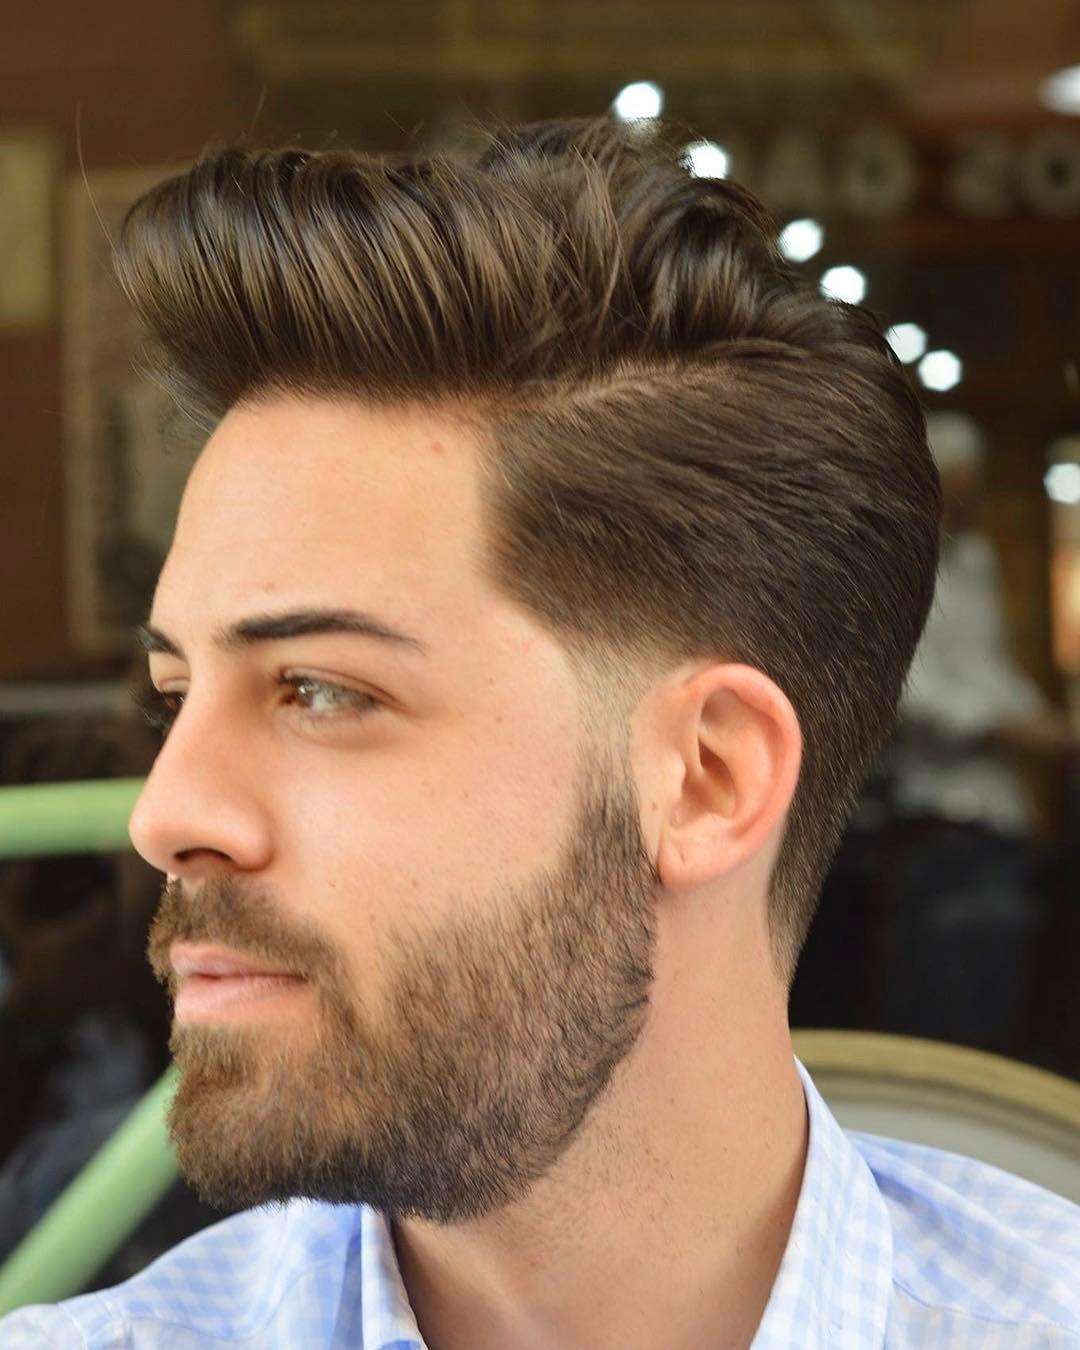 F 237 Garo Barbearia Sugere As Principais Tend 234 Ncias De Cabelo